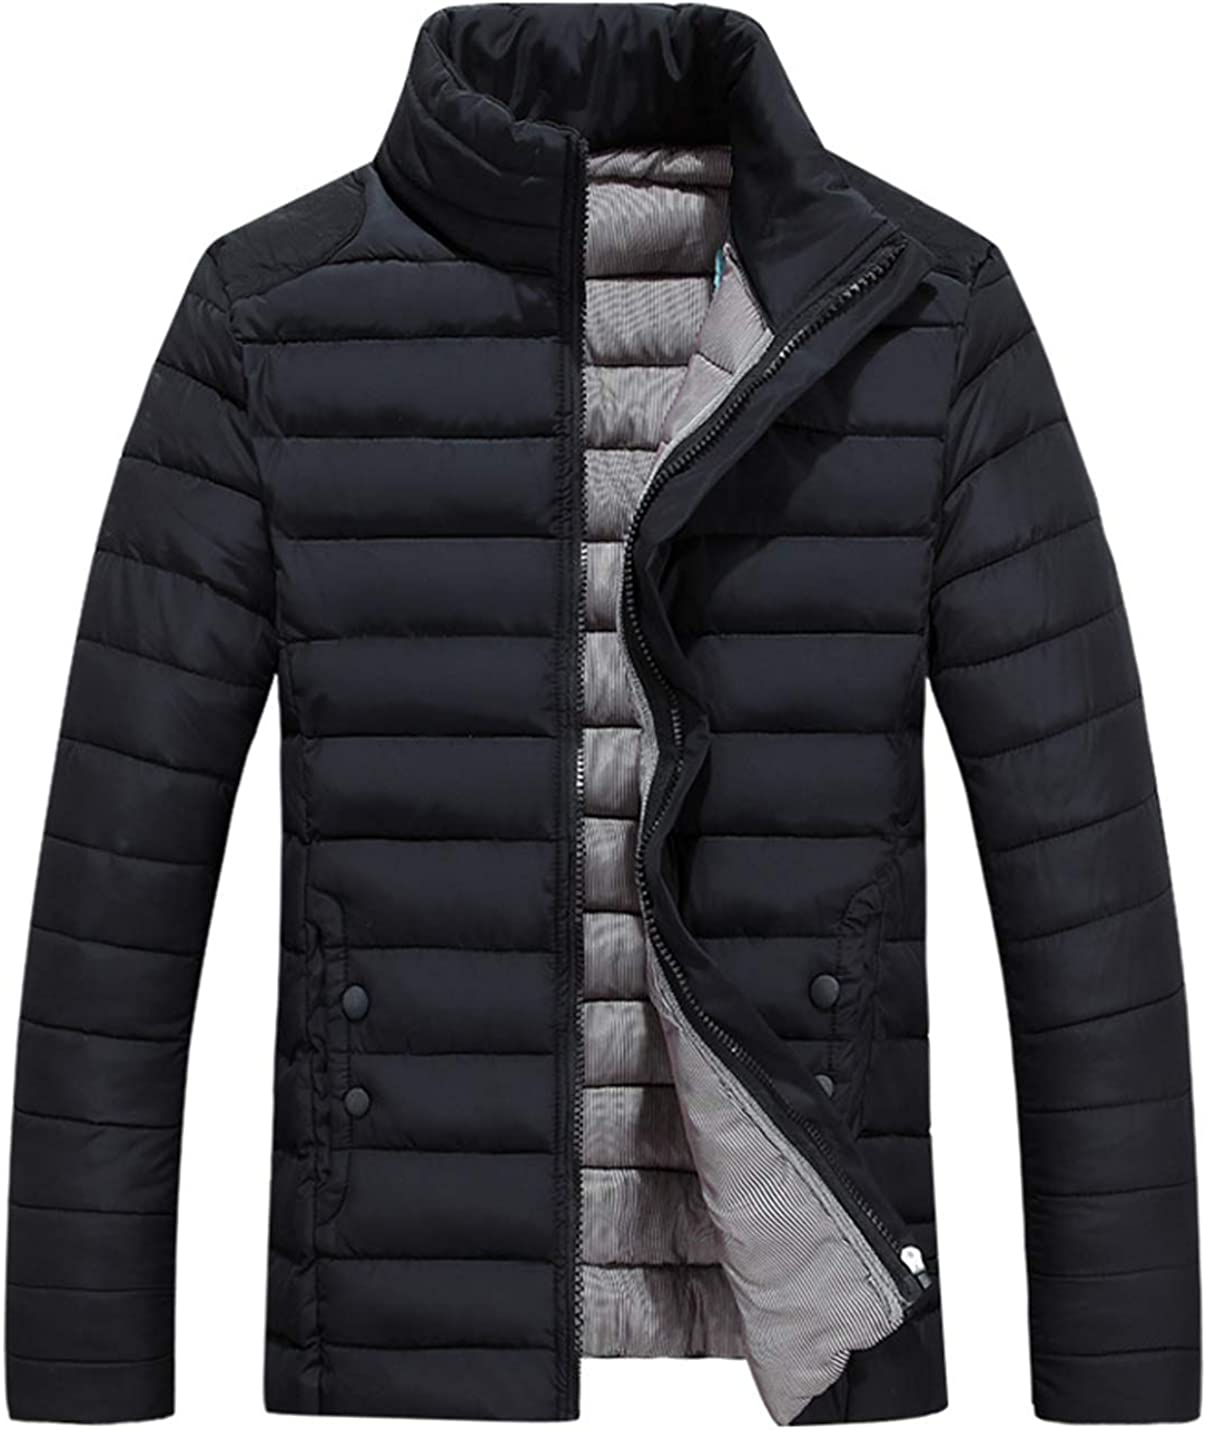 Lentta Men's Casual Full Zip Stand Collar Quilted Down Cotton Jacket Coat